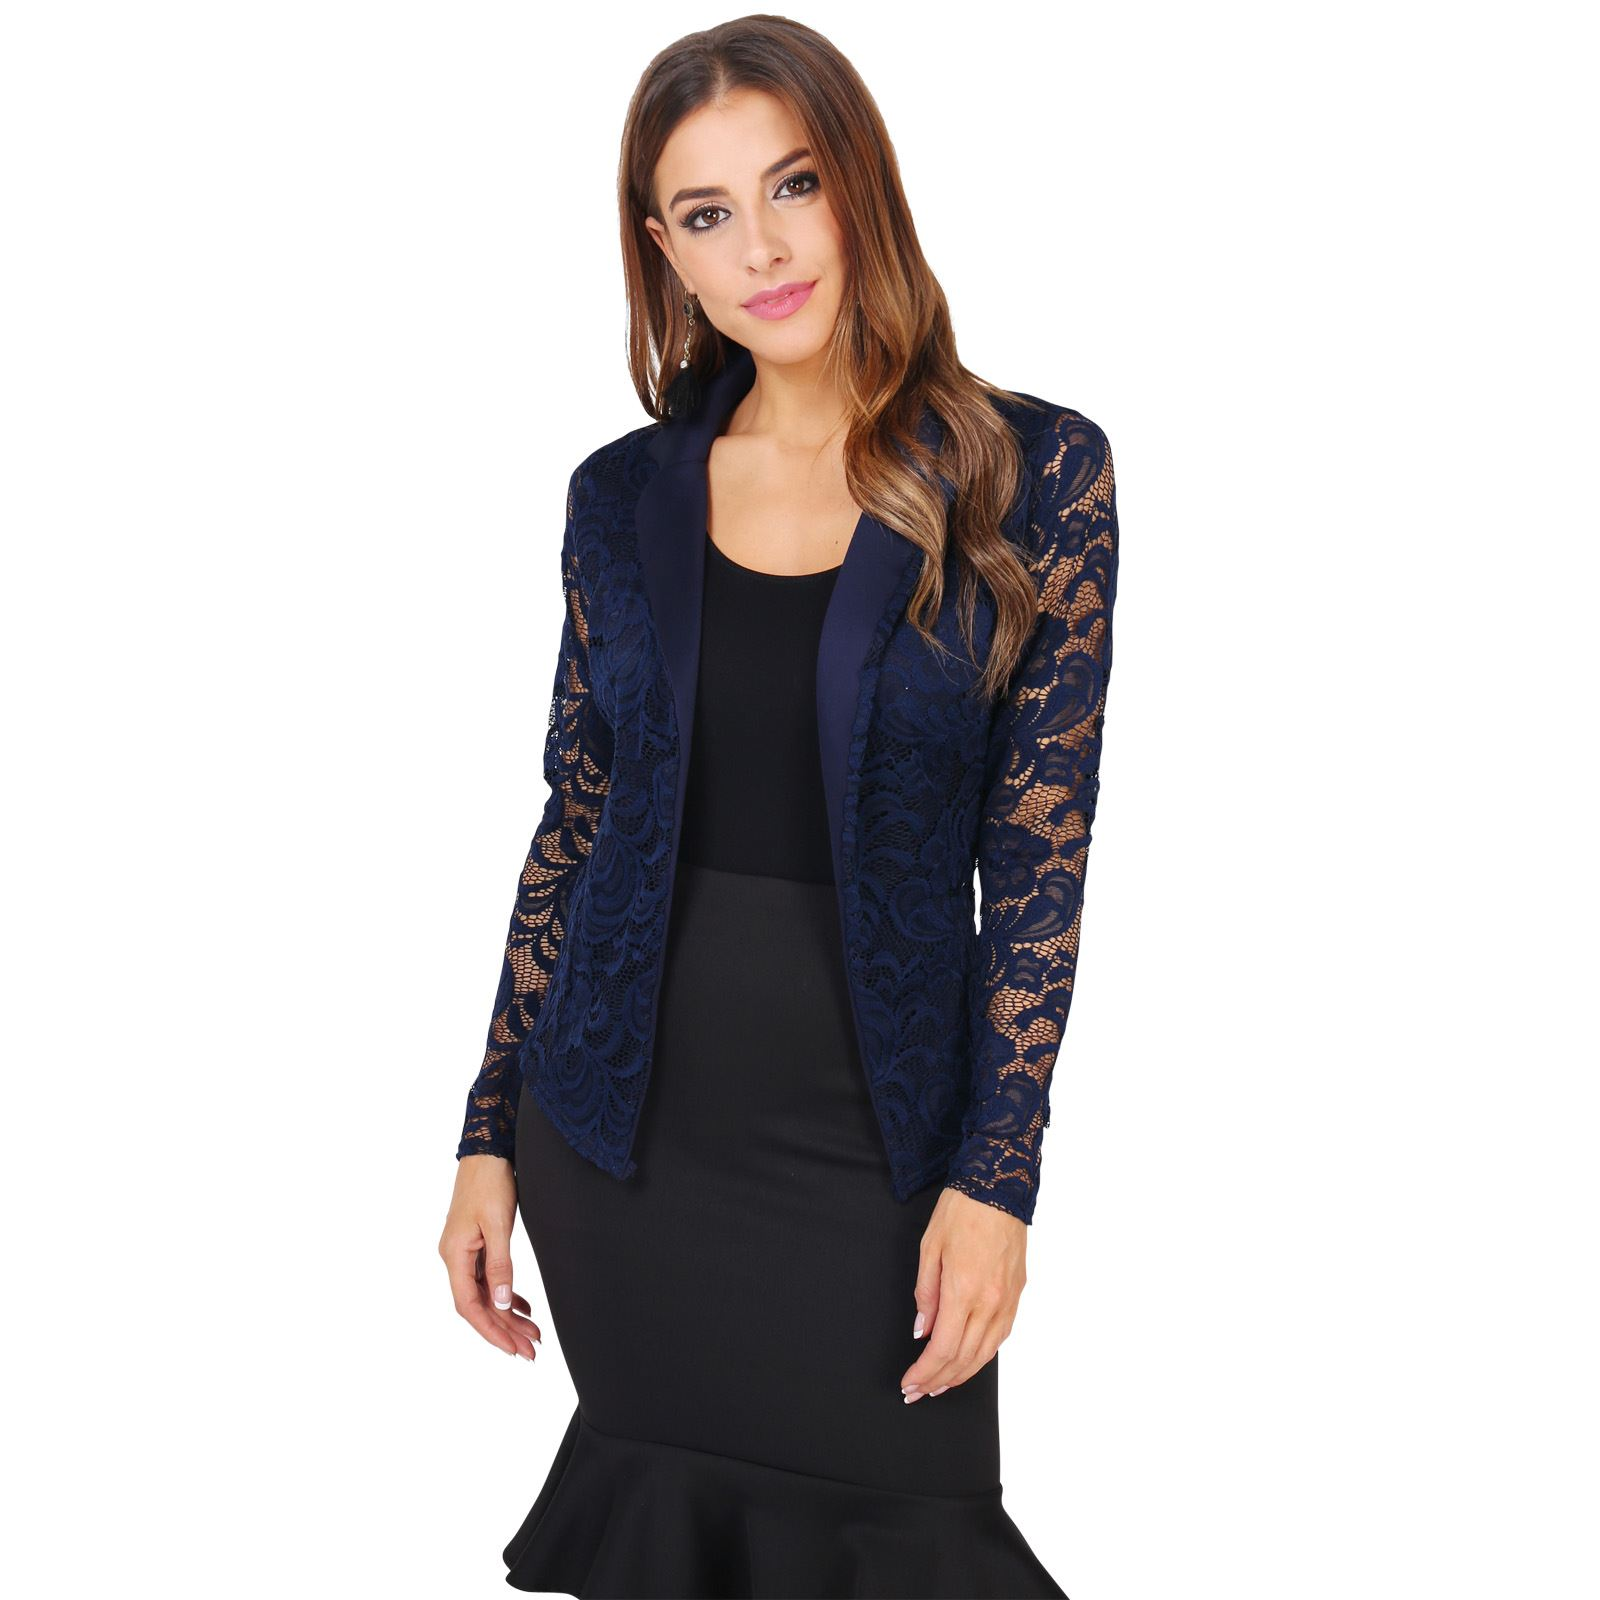 nuevo concepto 33b39 9f918 Detalles de Chaqueta Mujer Fiesta Punto Encaje Blazer Elegante Cardigan  Solapa Boda Original